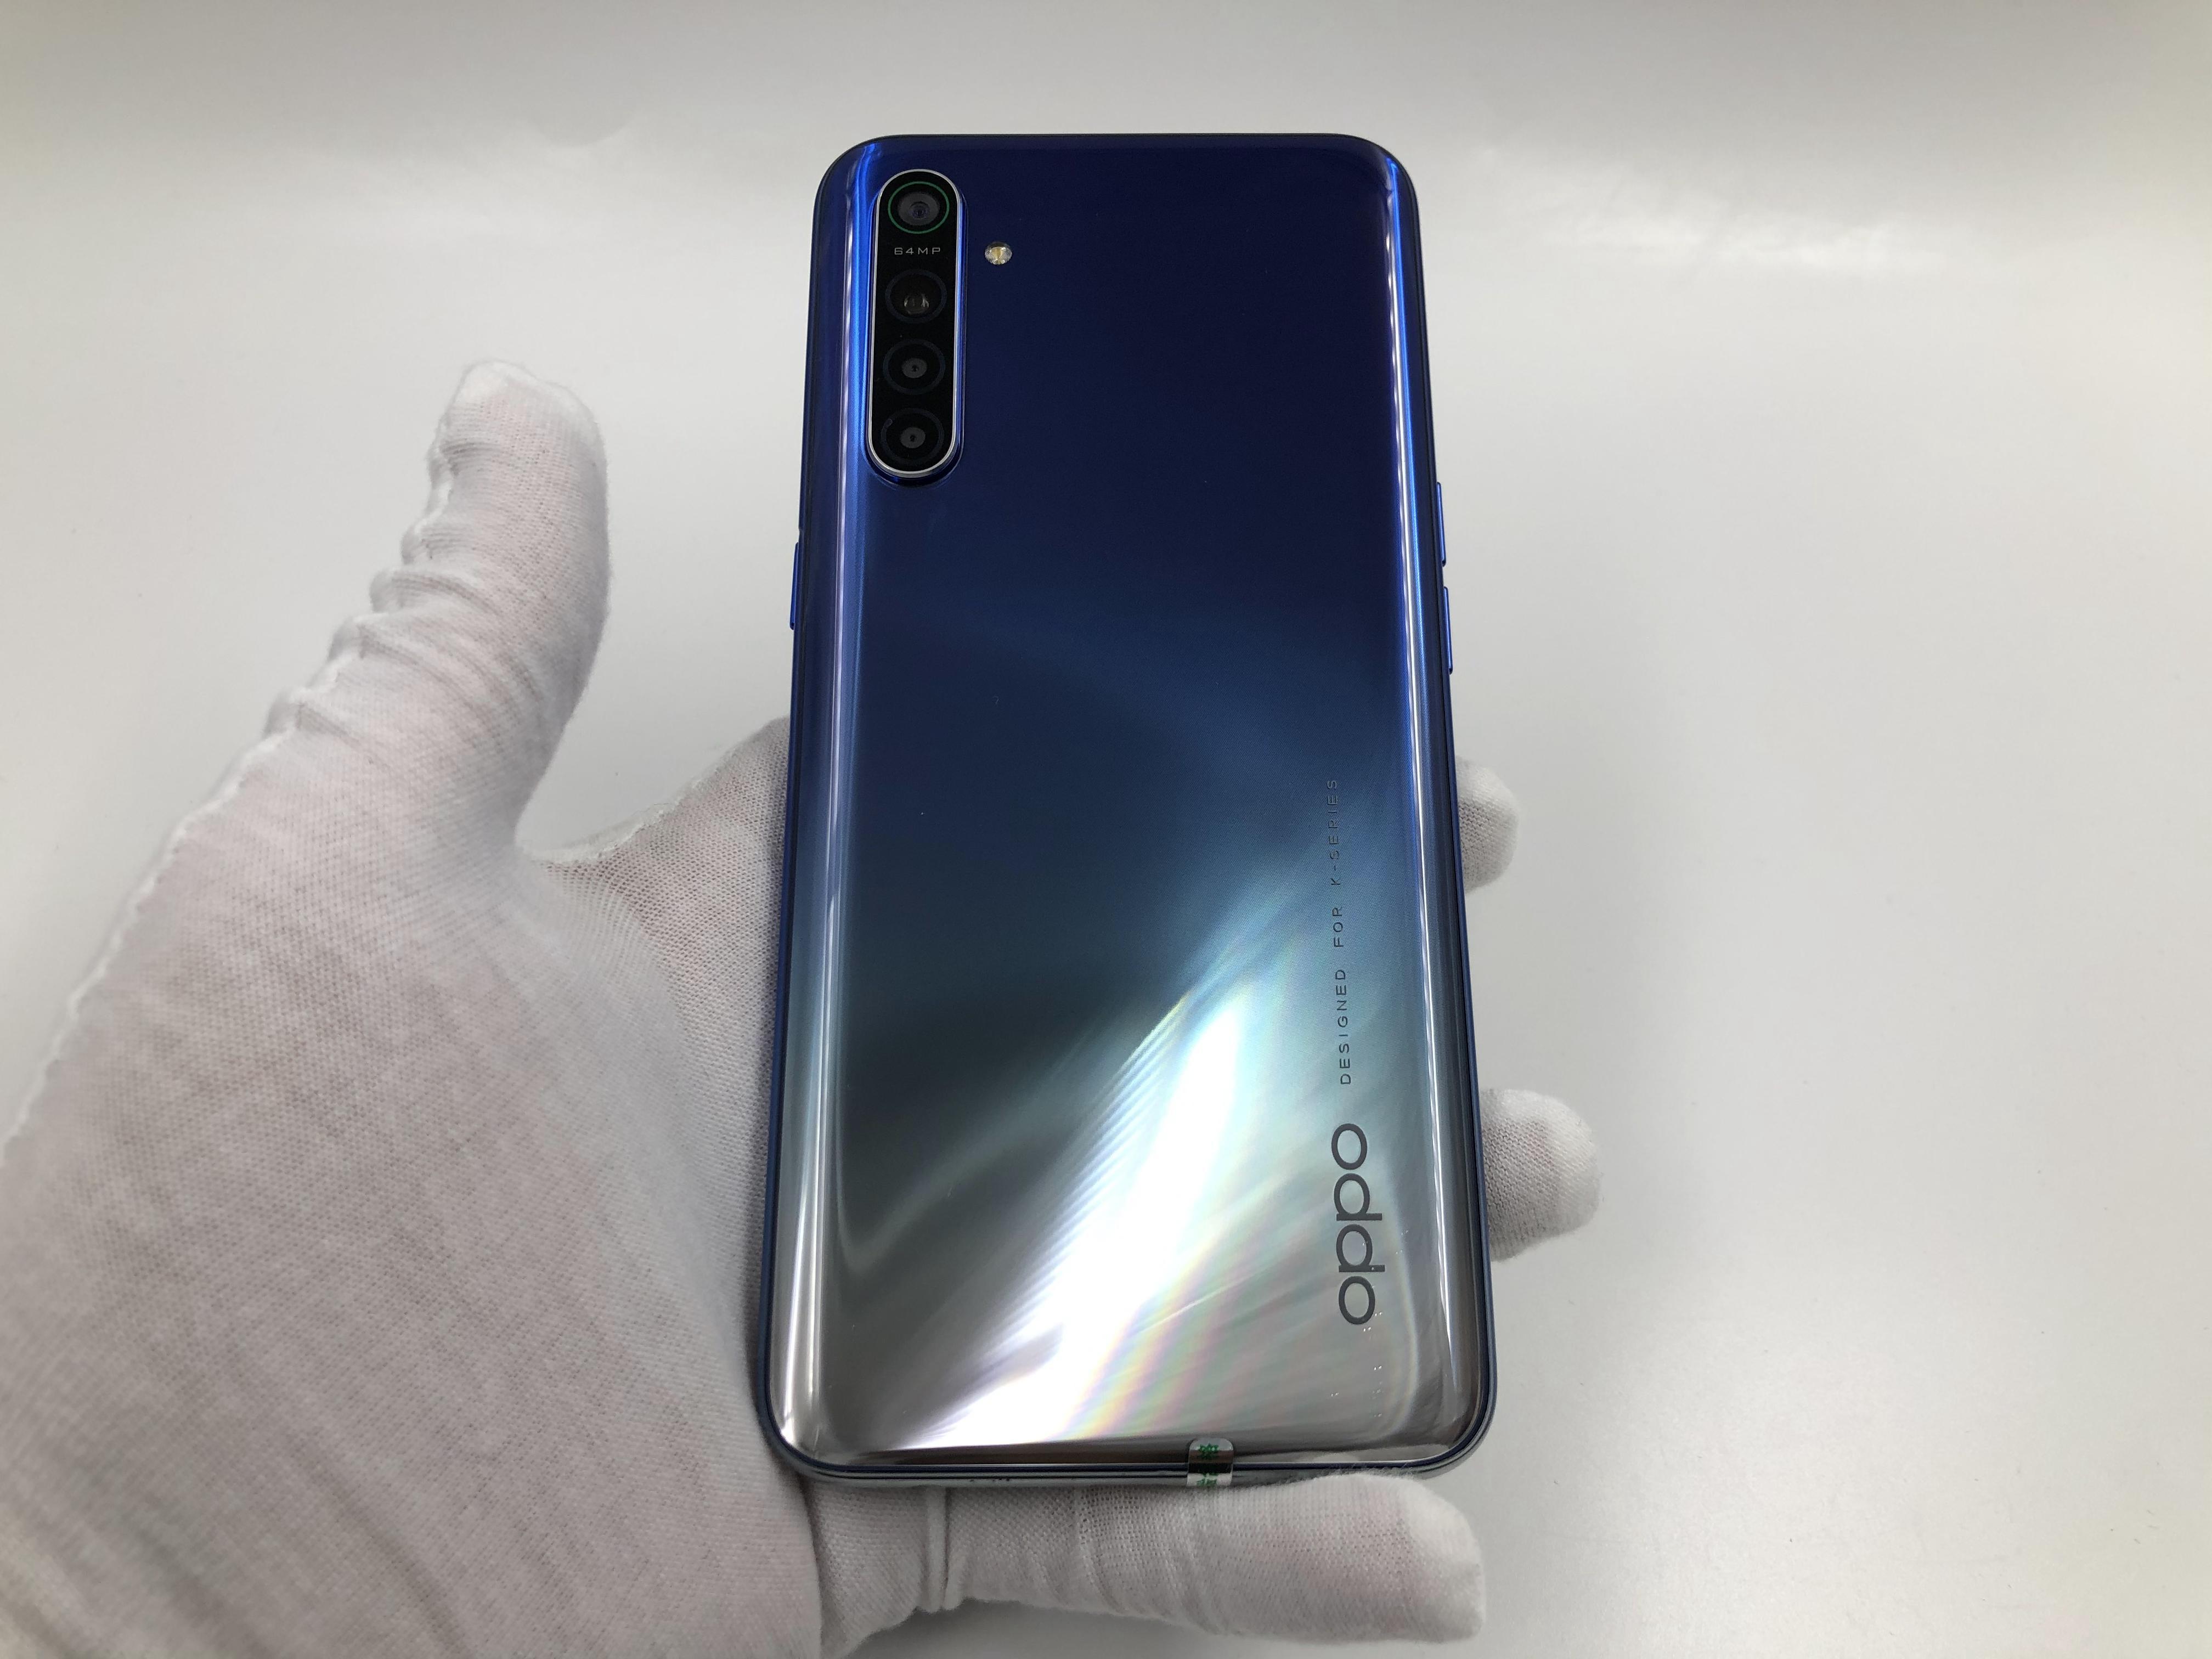 oppo【K5】4G全网通 赛博金属 8G/128G 国行 9成新 真机实拍